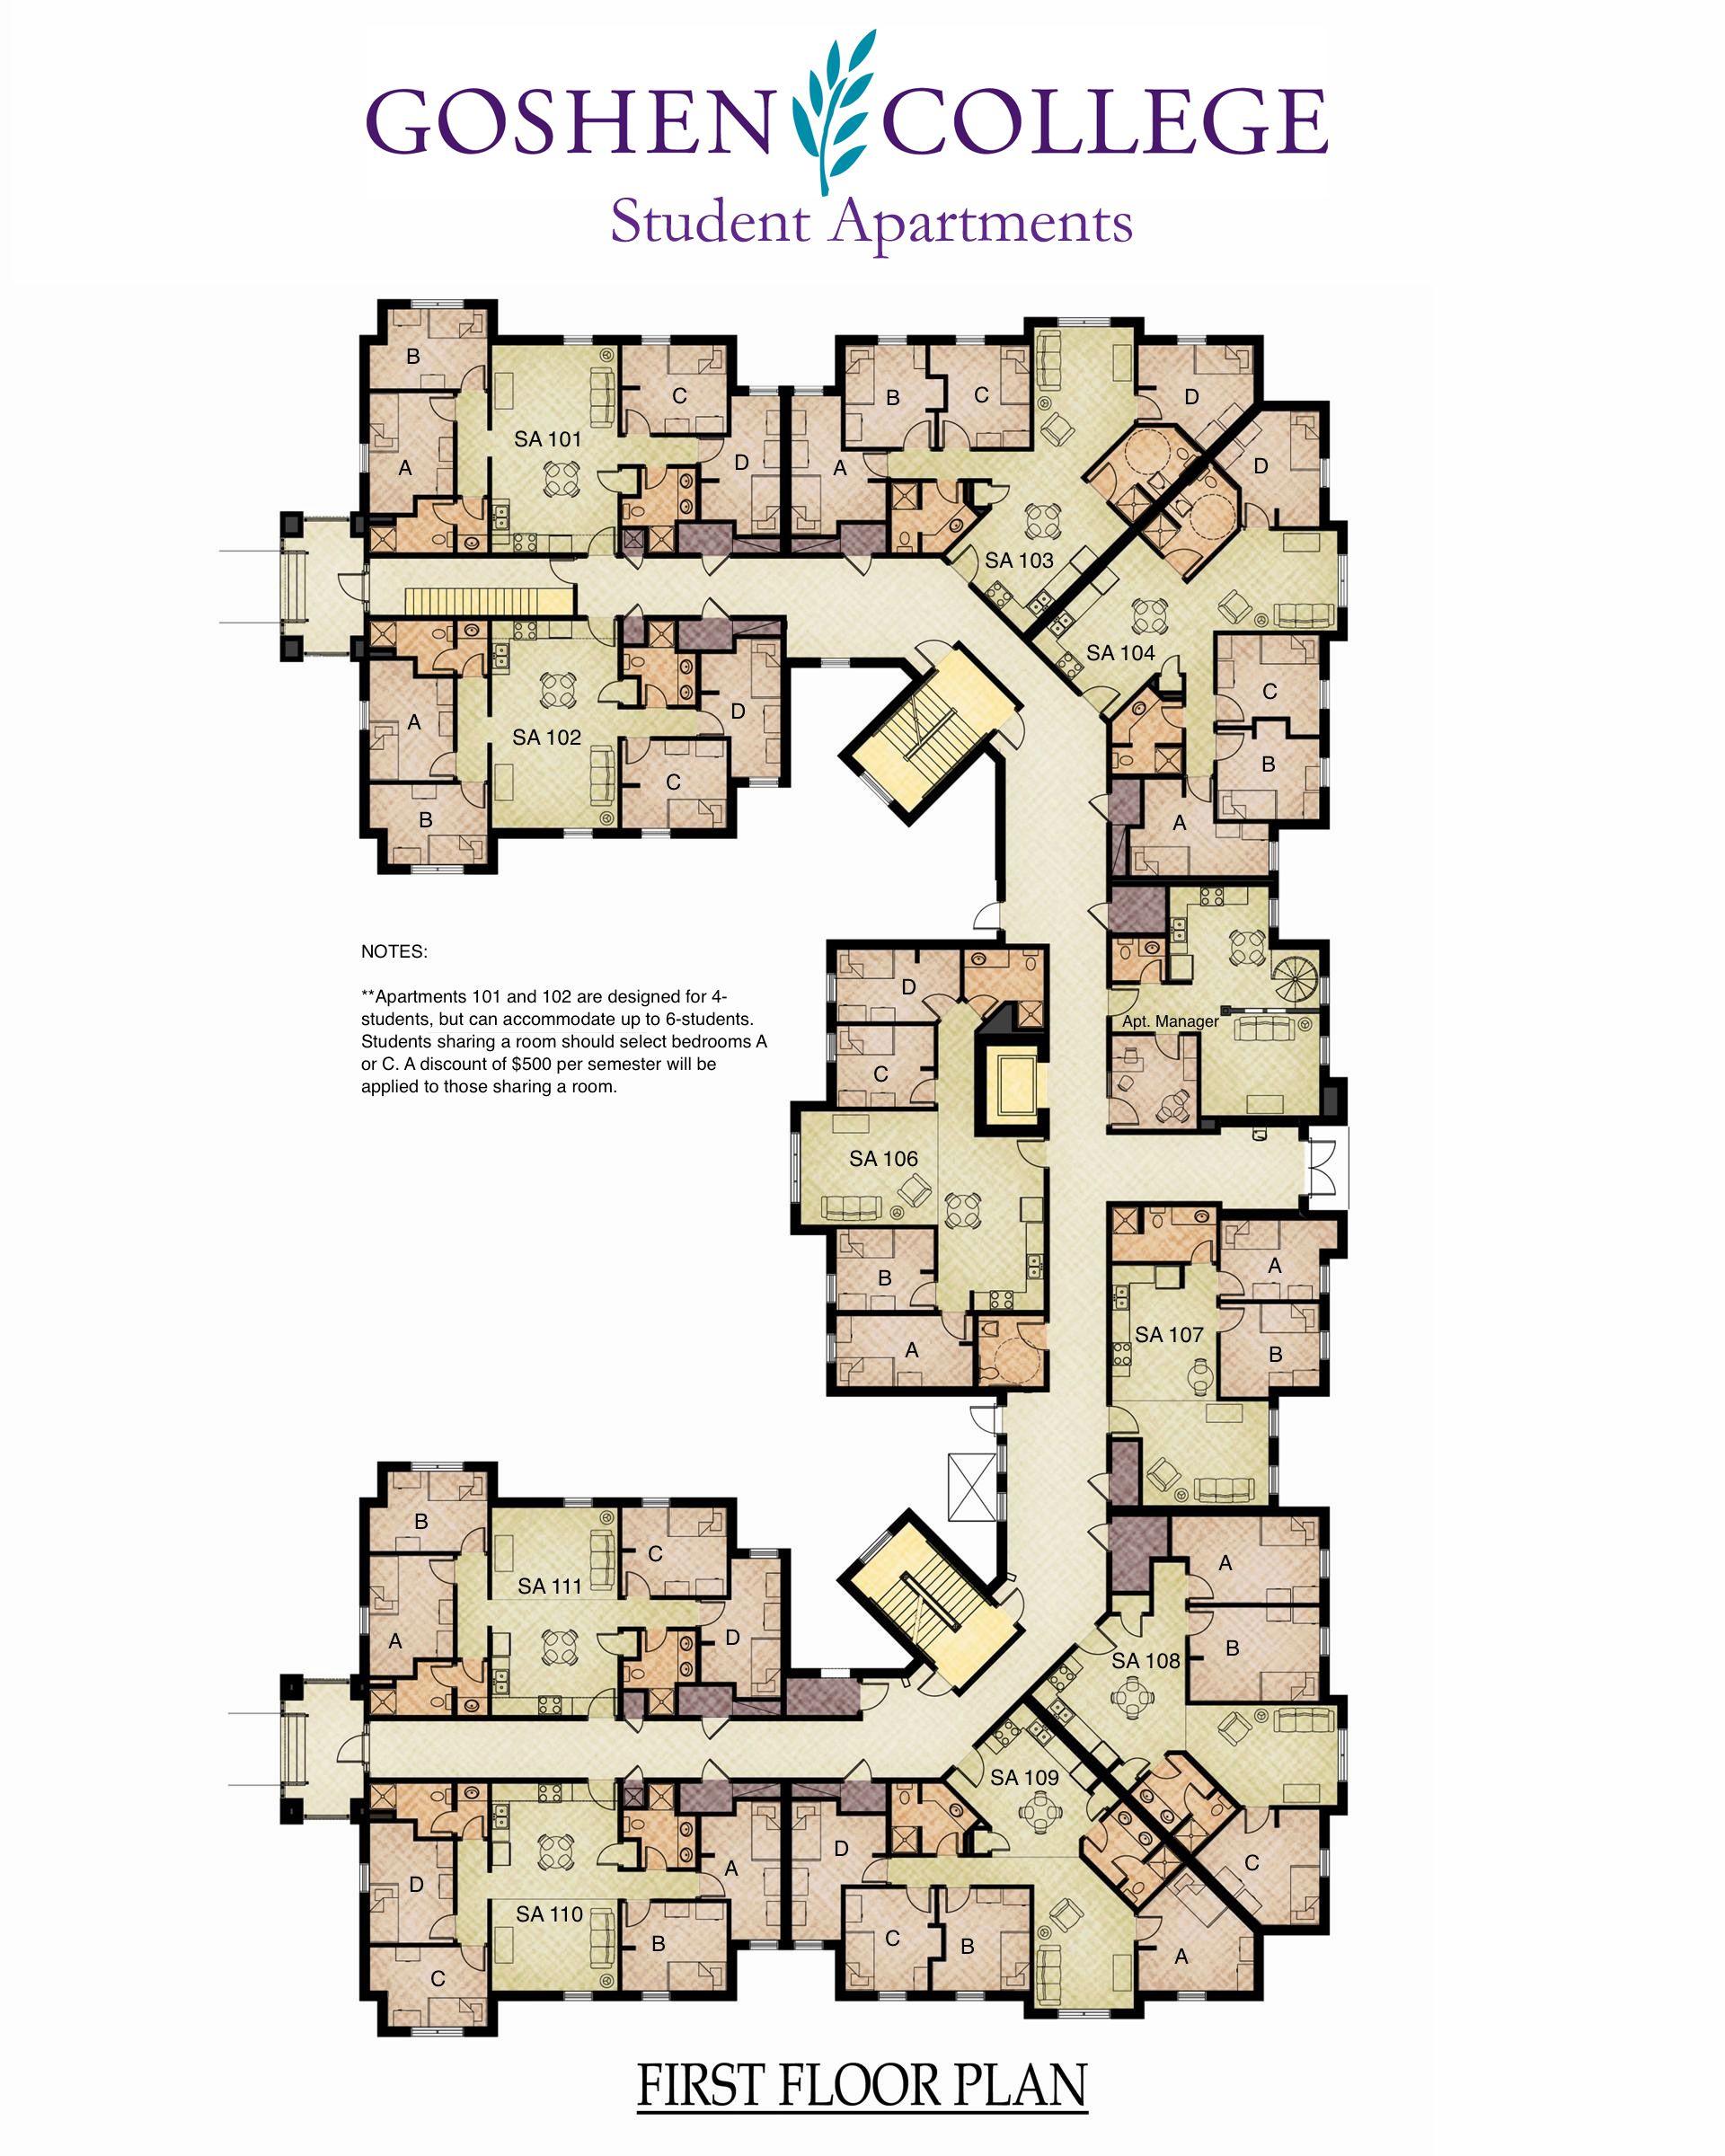 Apartment Building Floor Plan Designs Apartments Apartment Building Design Ideas Apartment Affordable Rentals Apartment Design Design Planning